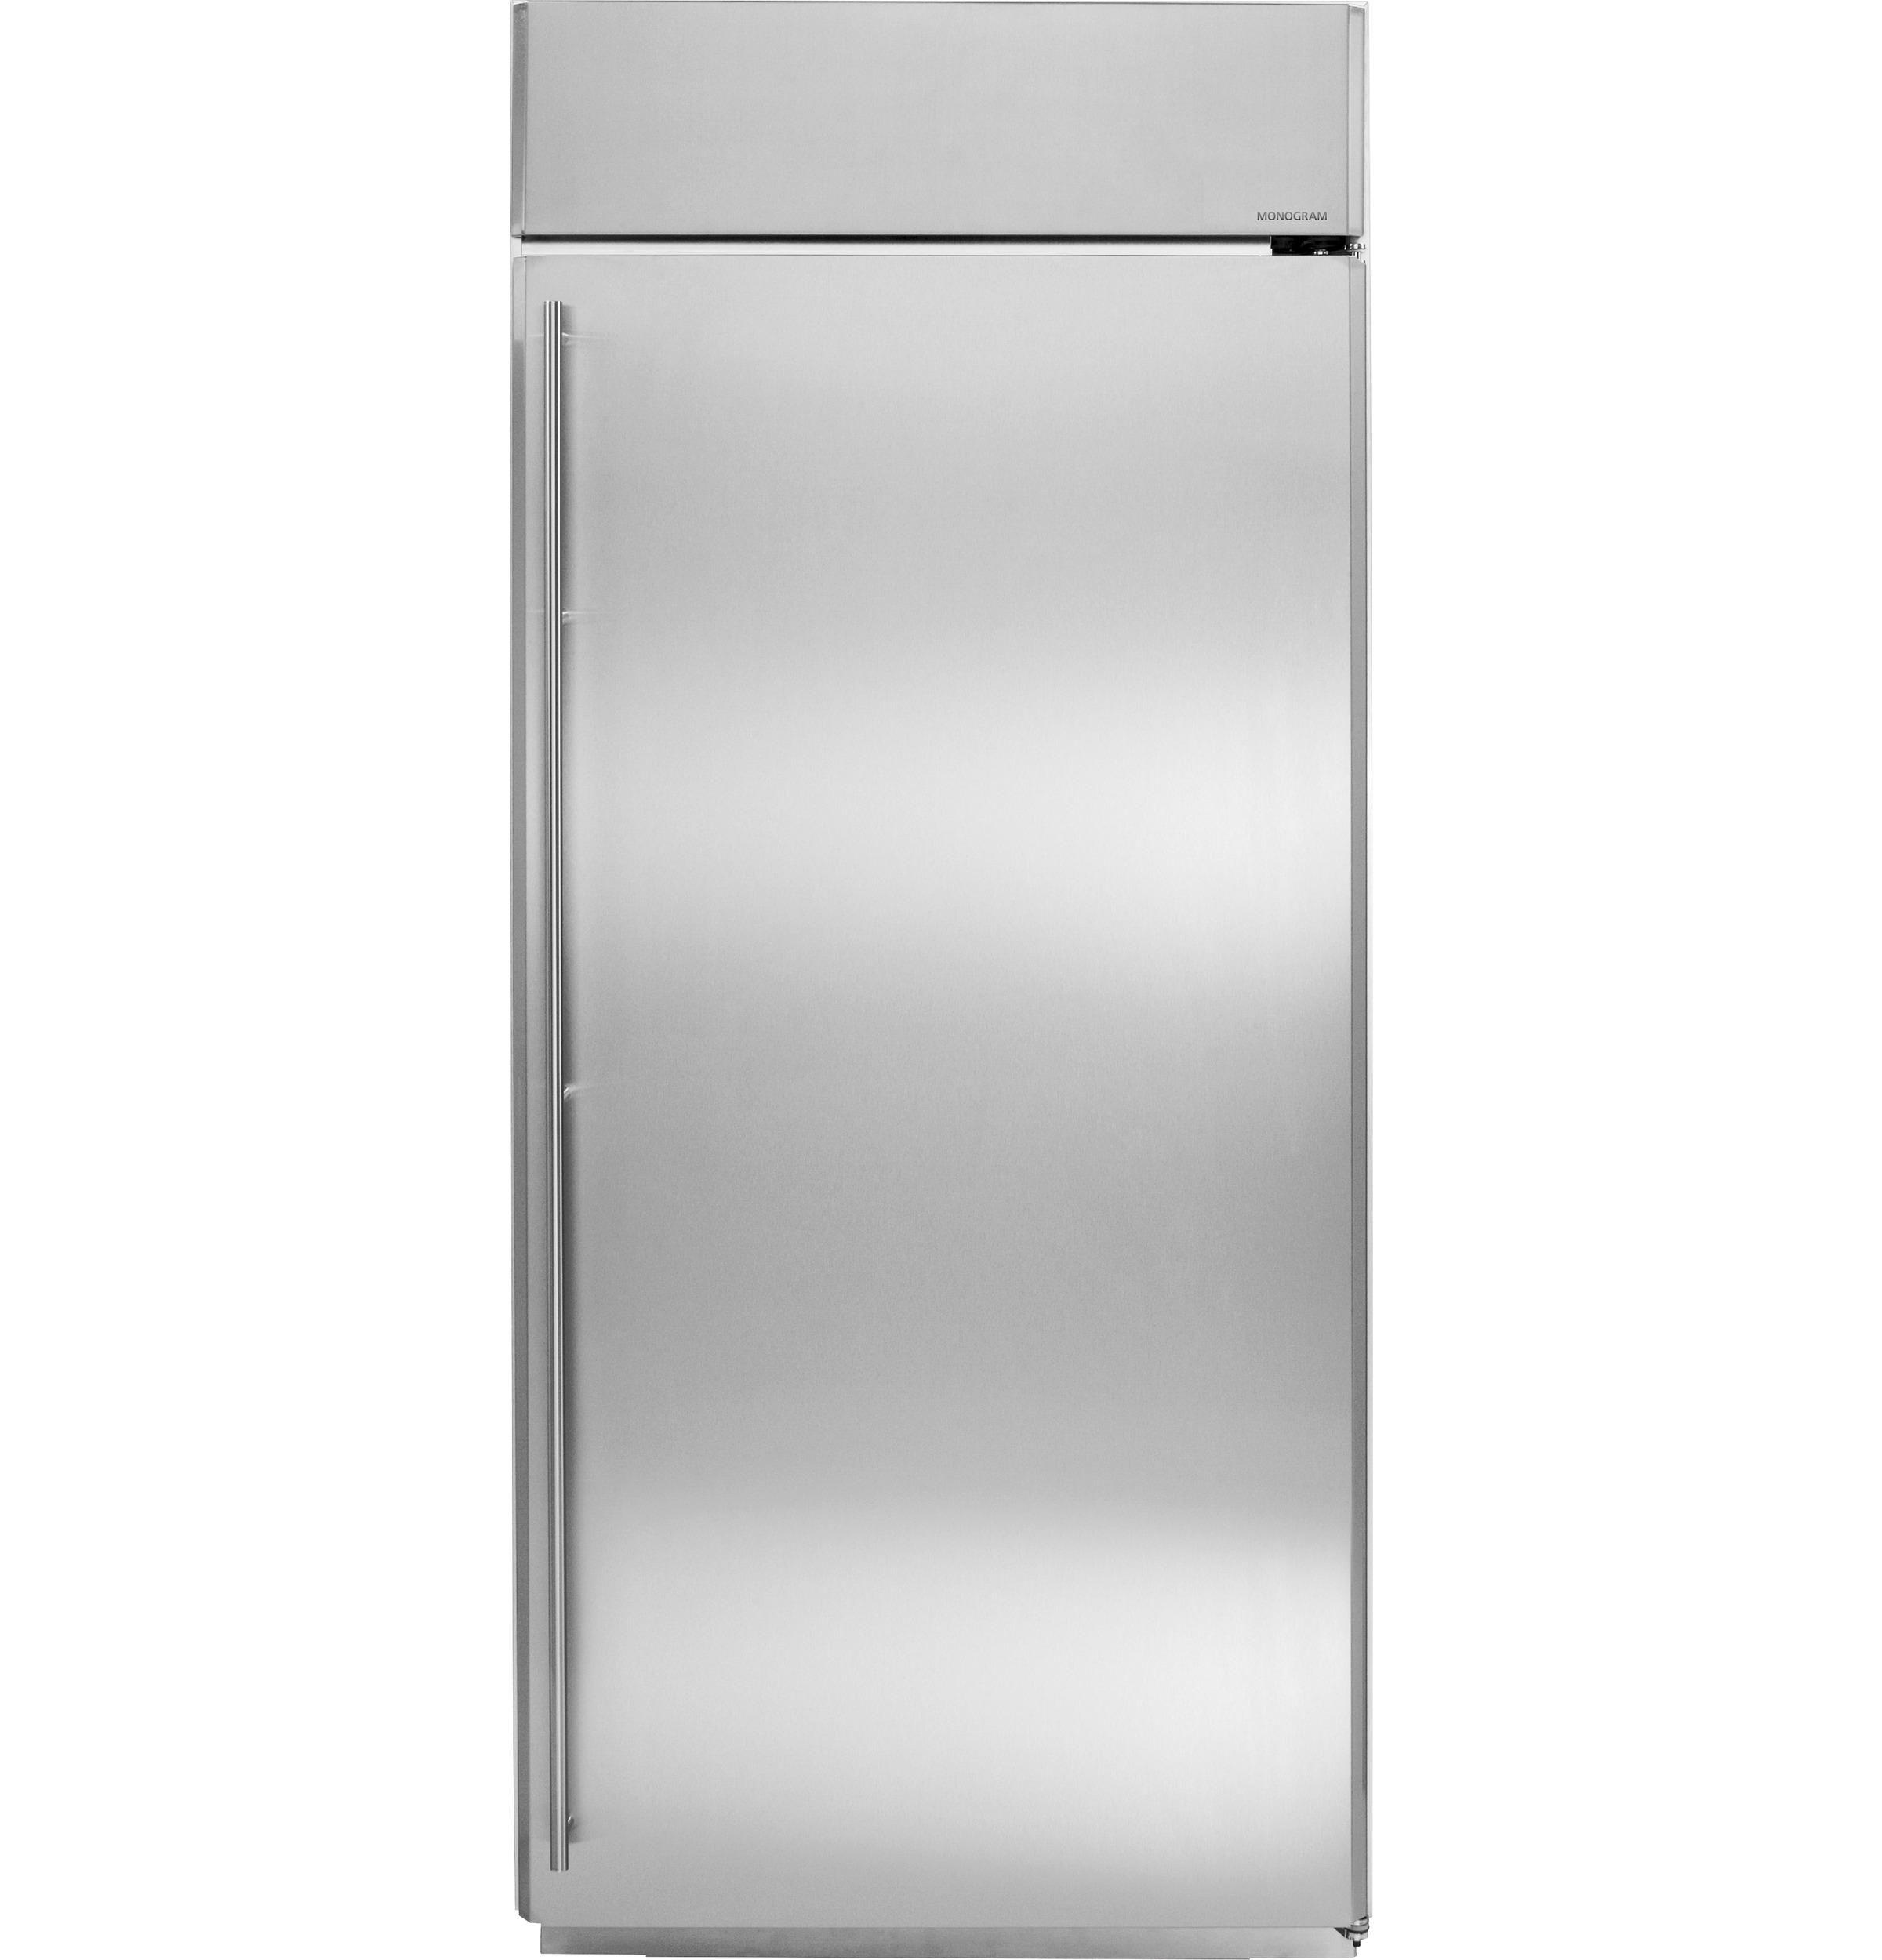 Zirs360nhrh Ge Monogram Monogram All Refrigerator Monogram Appliances Glass Shelves